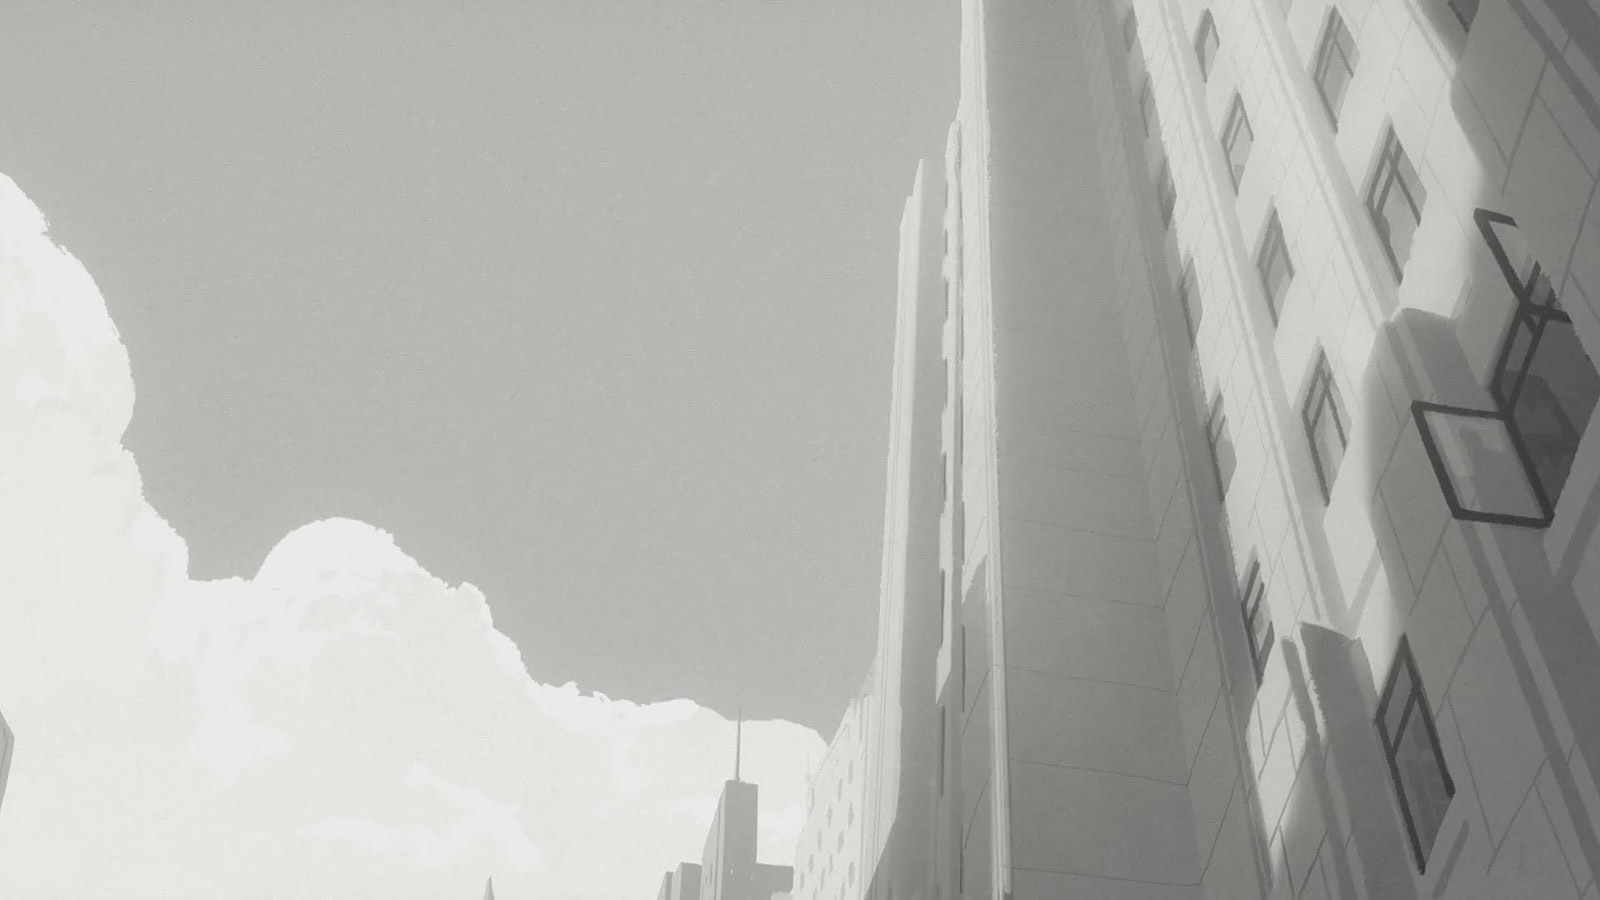 paperman-background-07.jpg